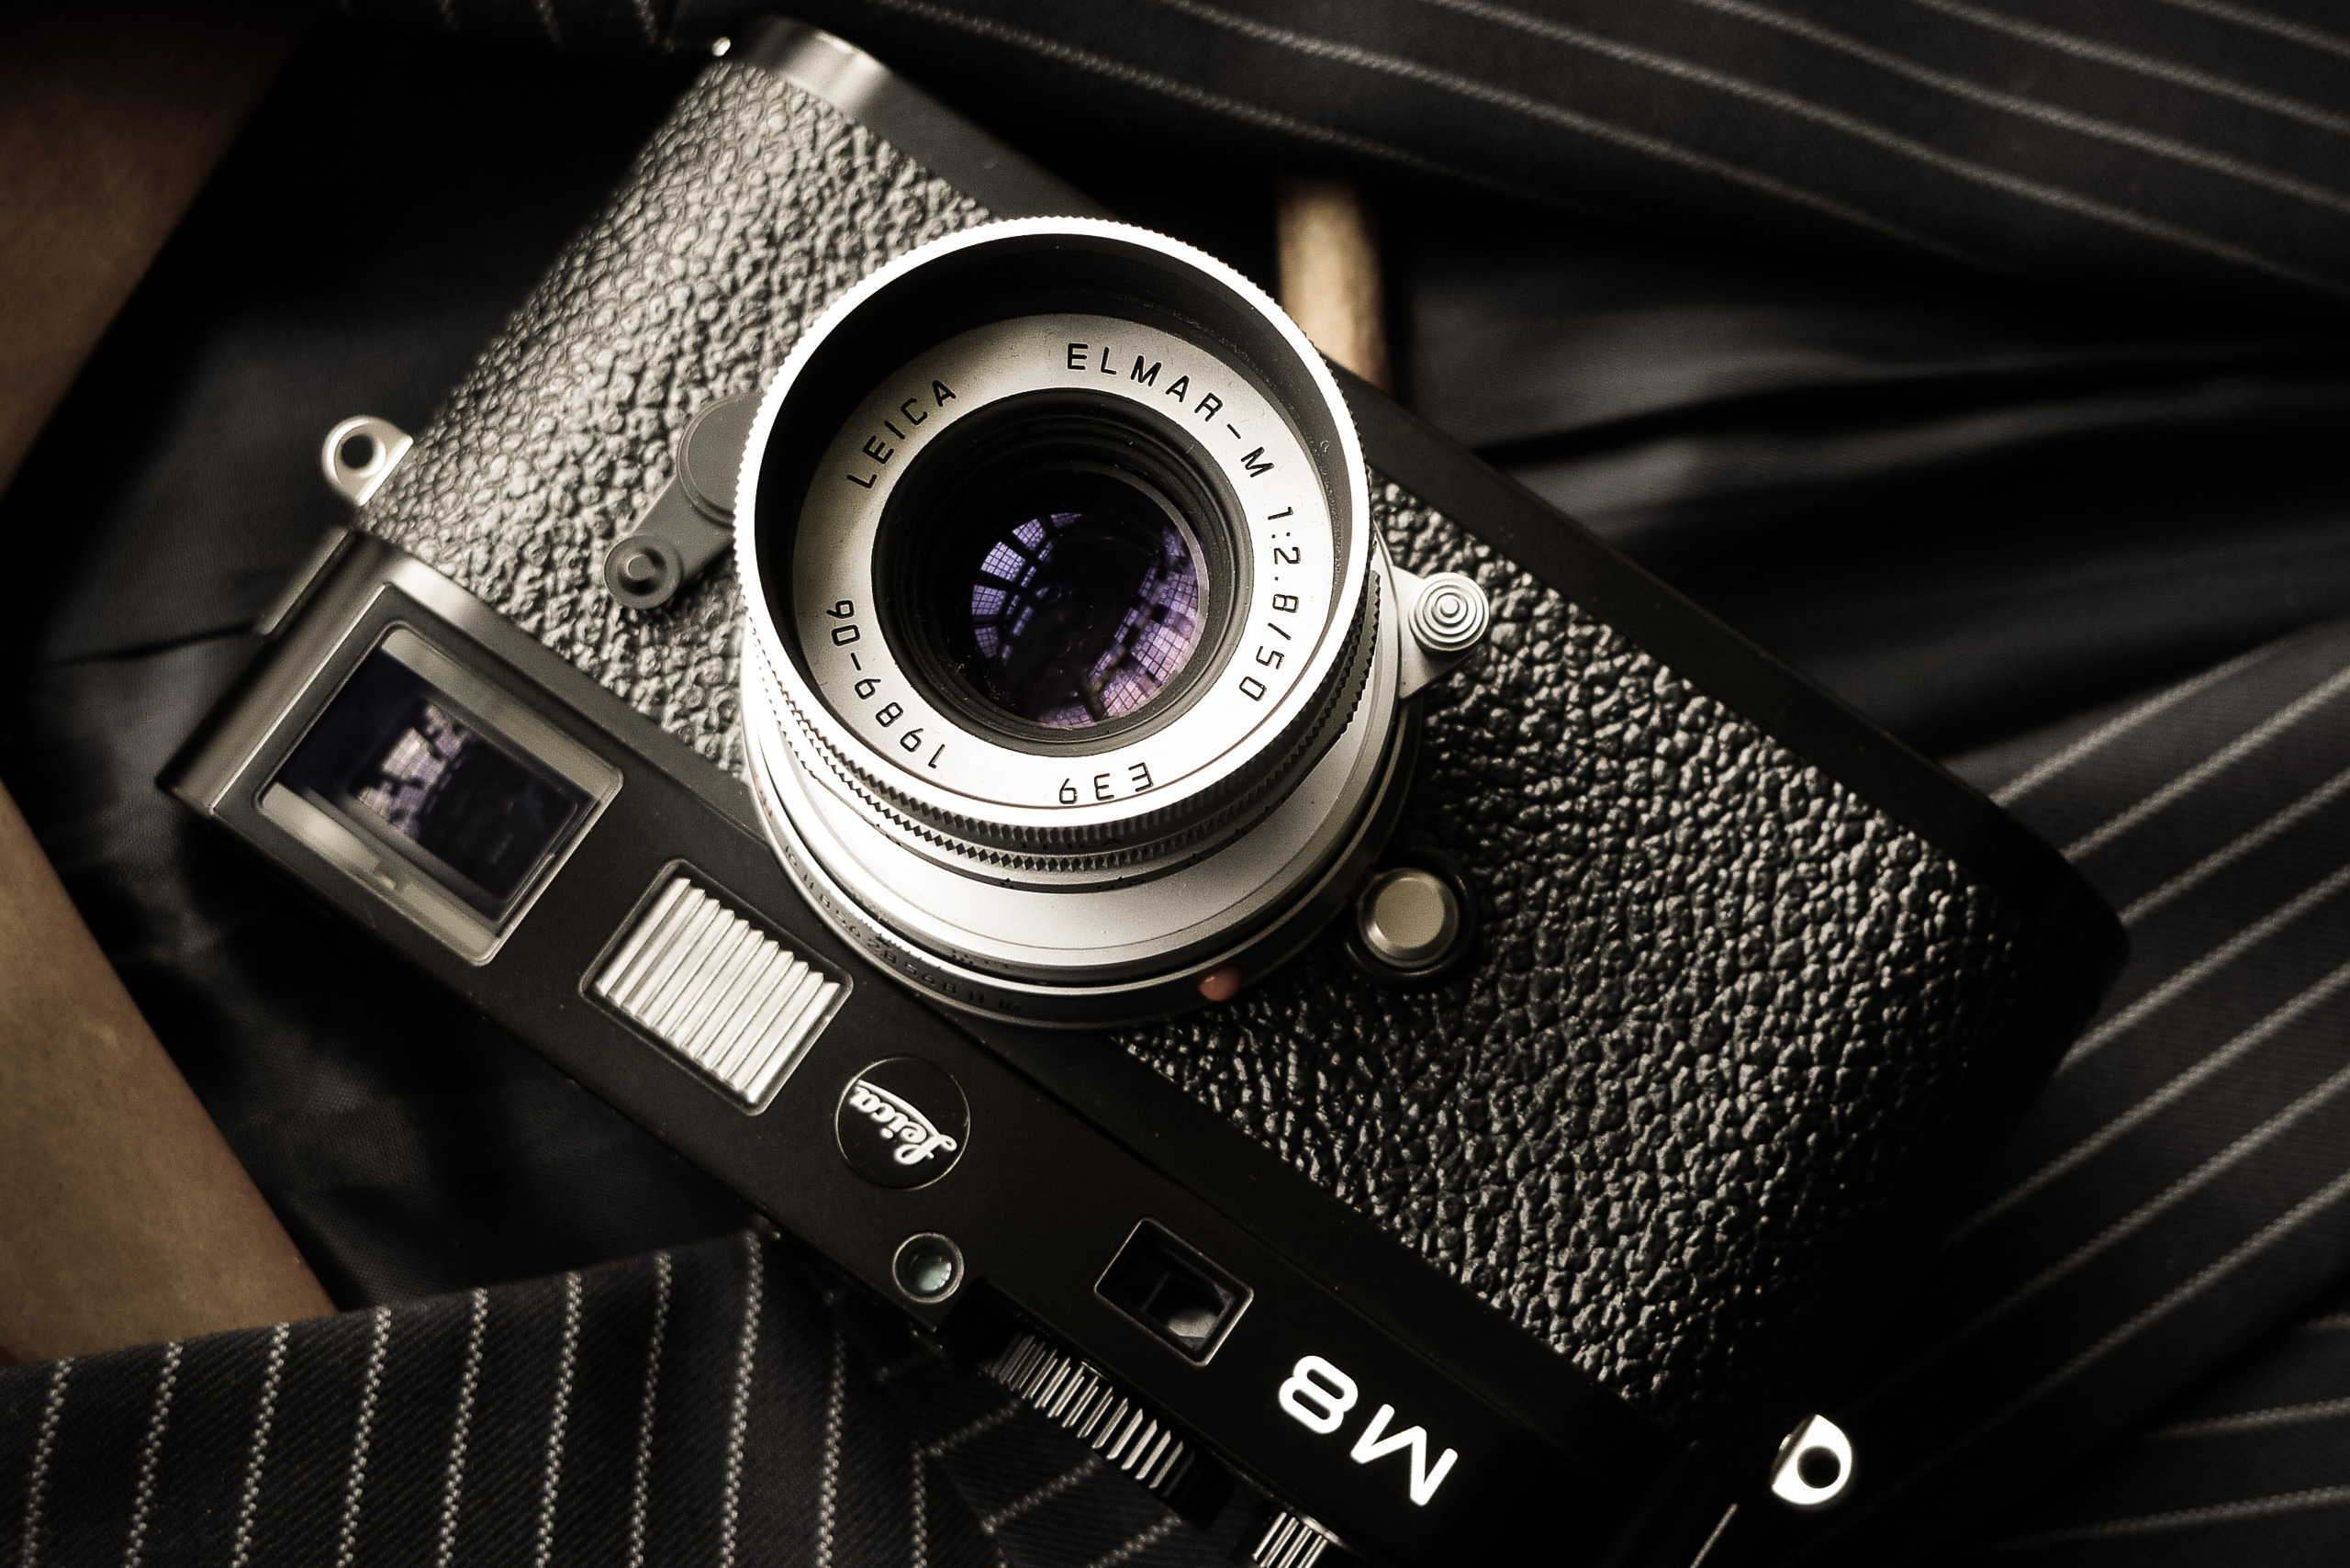 Elements Gallery M8 2 Camera Elmar Wedding Suit By Brett Leica Photographer